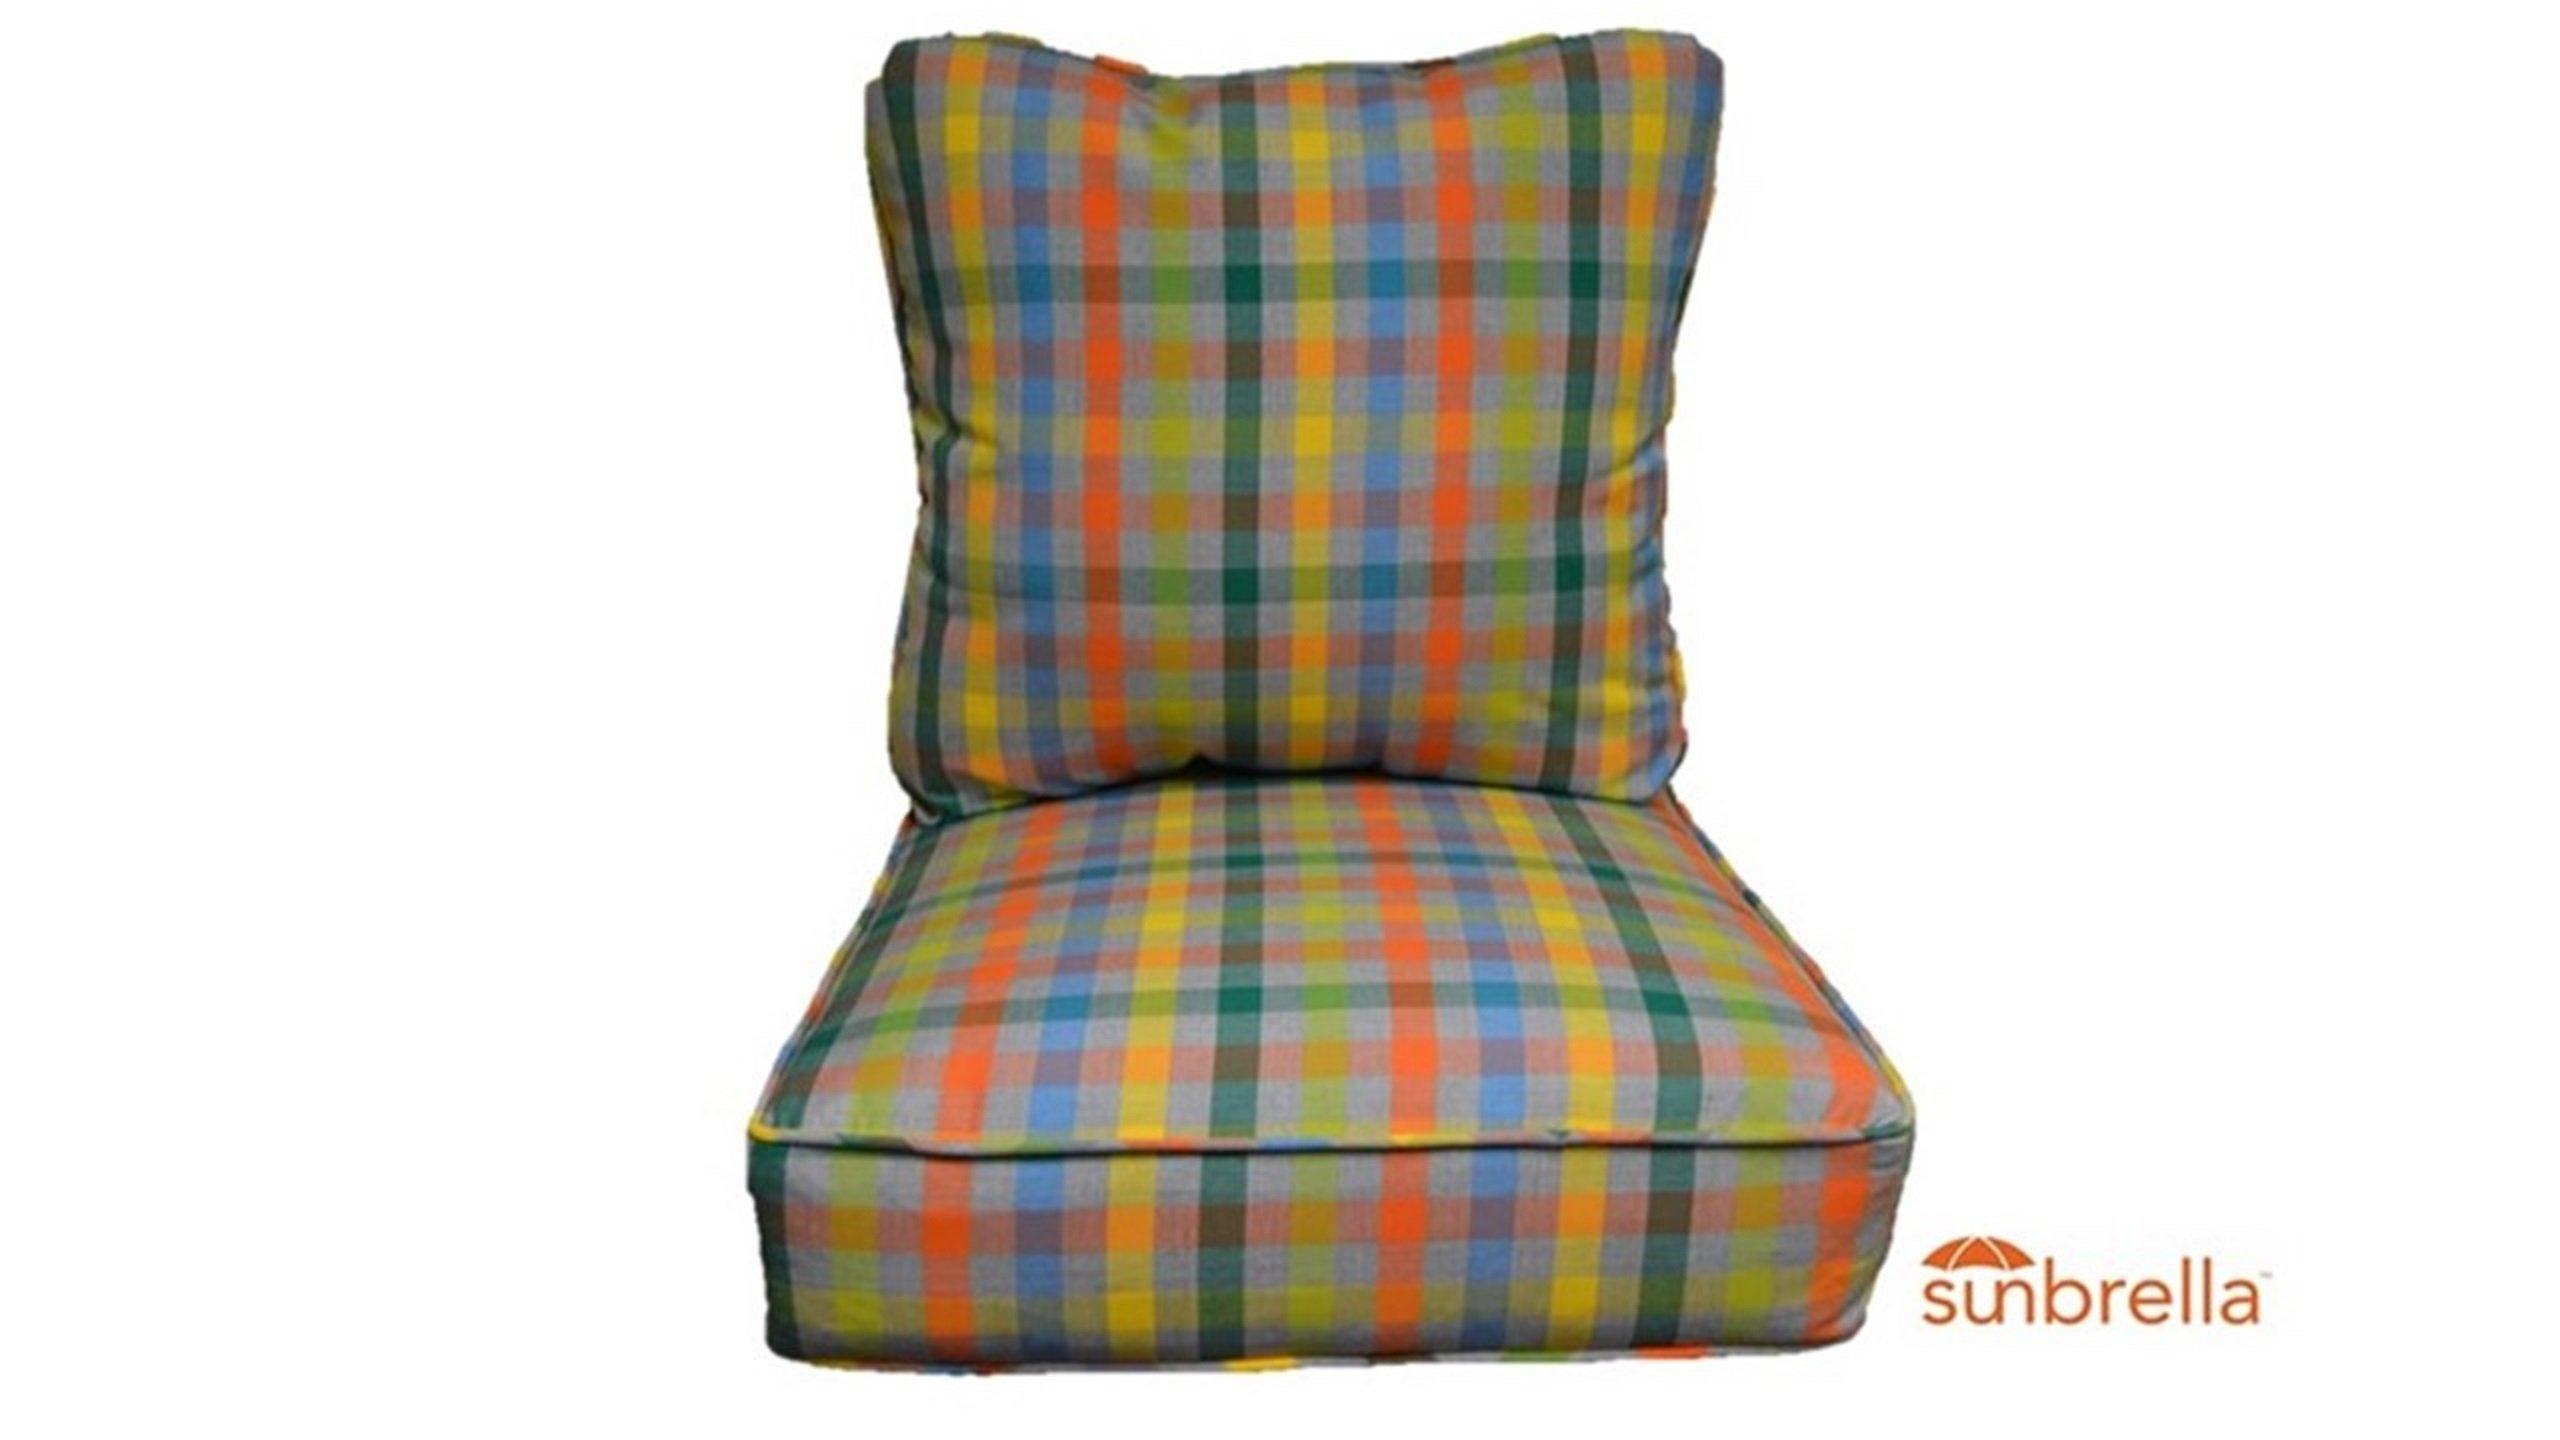 Sunbrella Connect Fusion Green Yellow Orange Plaid Cushion Set for Indoor / Outdoor Deep Seat Furniture Chair - Choose Size (Seat Cushion 24'' w X 27'' d)